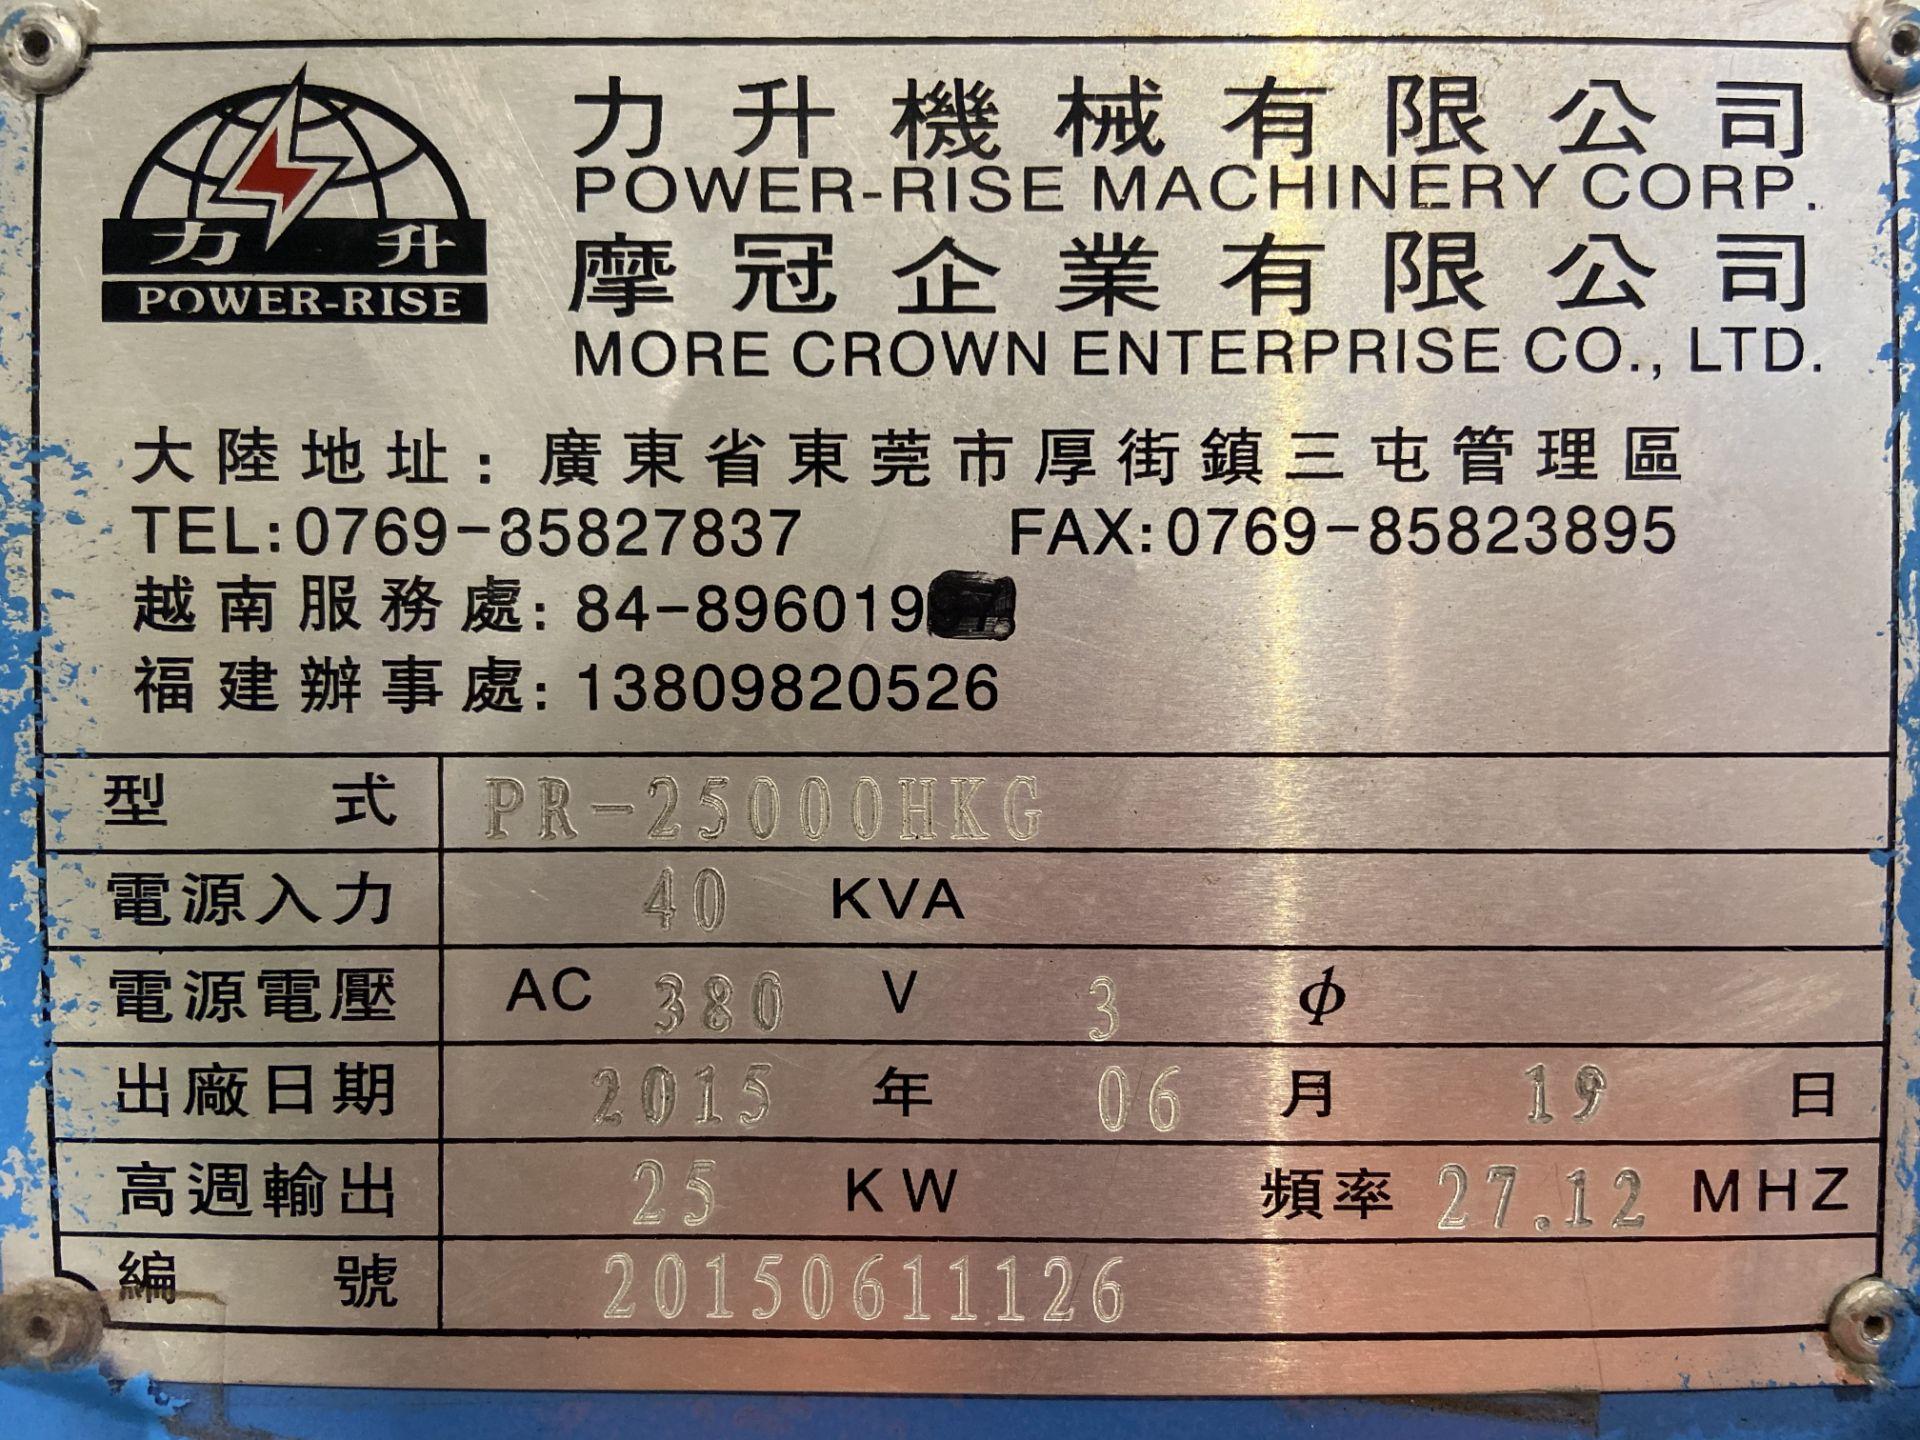 Lot 40 - Máquina de soldadura de alta frecuencia marca Power-Rise, Modelo: PR-25000HKG